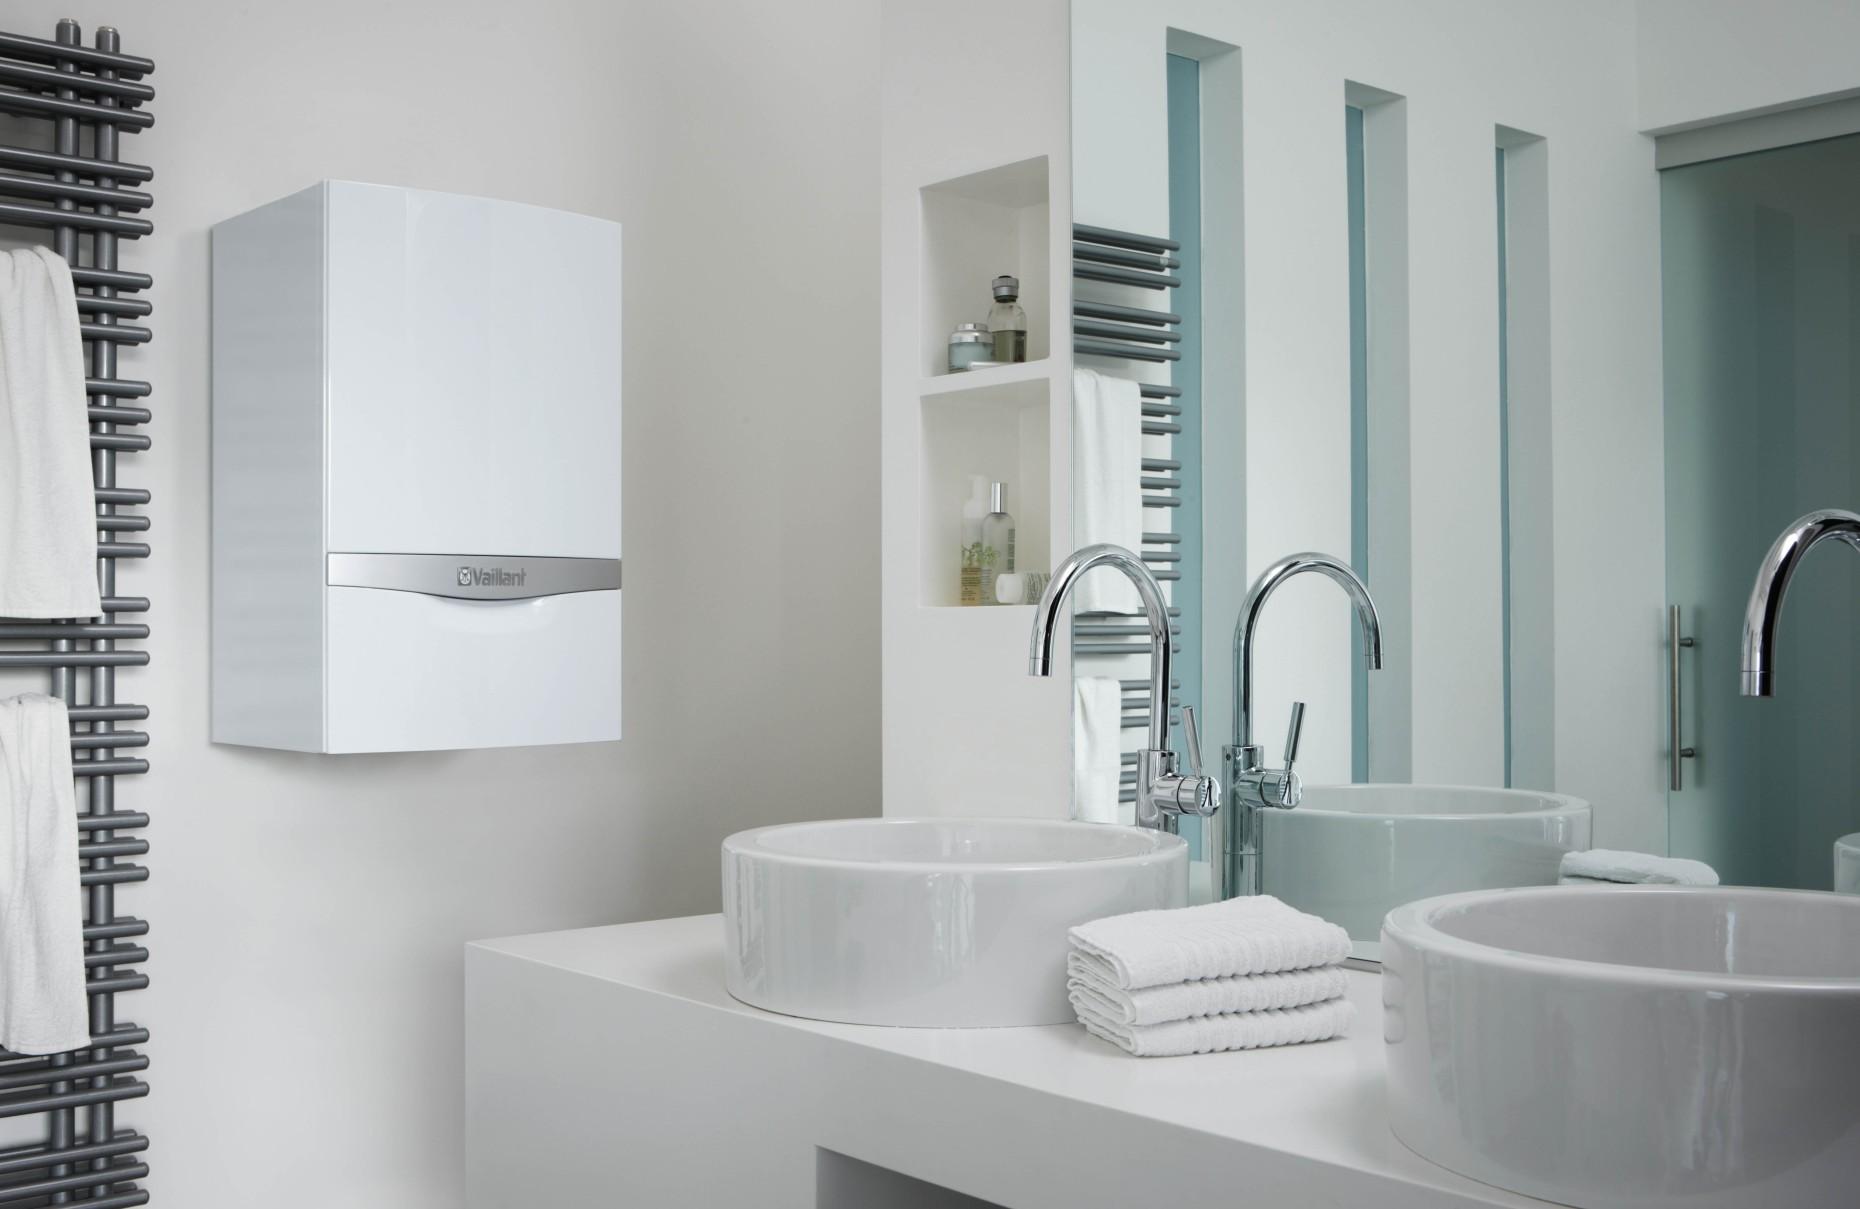 wandheizger t ecotec plus vc vcw produktinfos vaillant. Black Bedroom Furniture Sets. Home Design Ideas